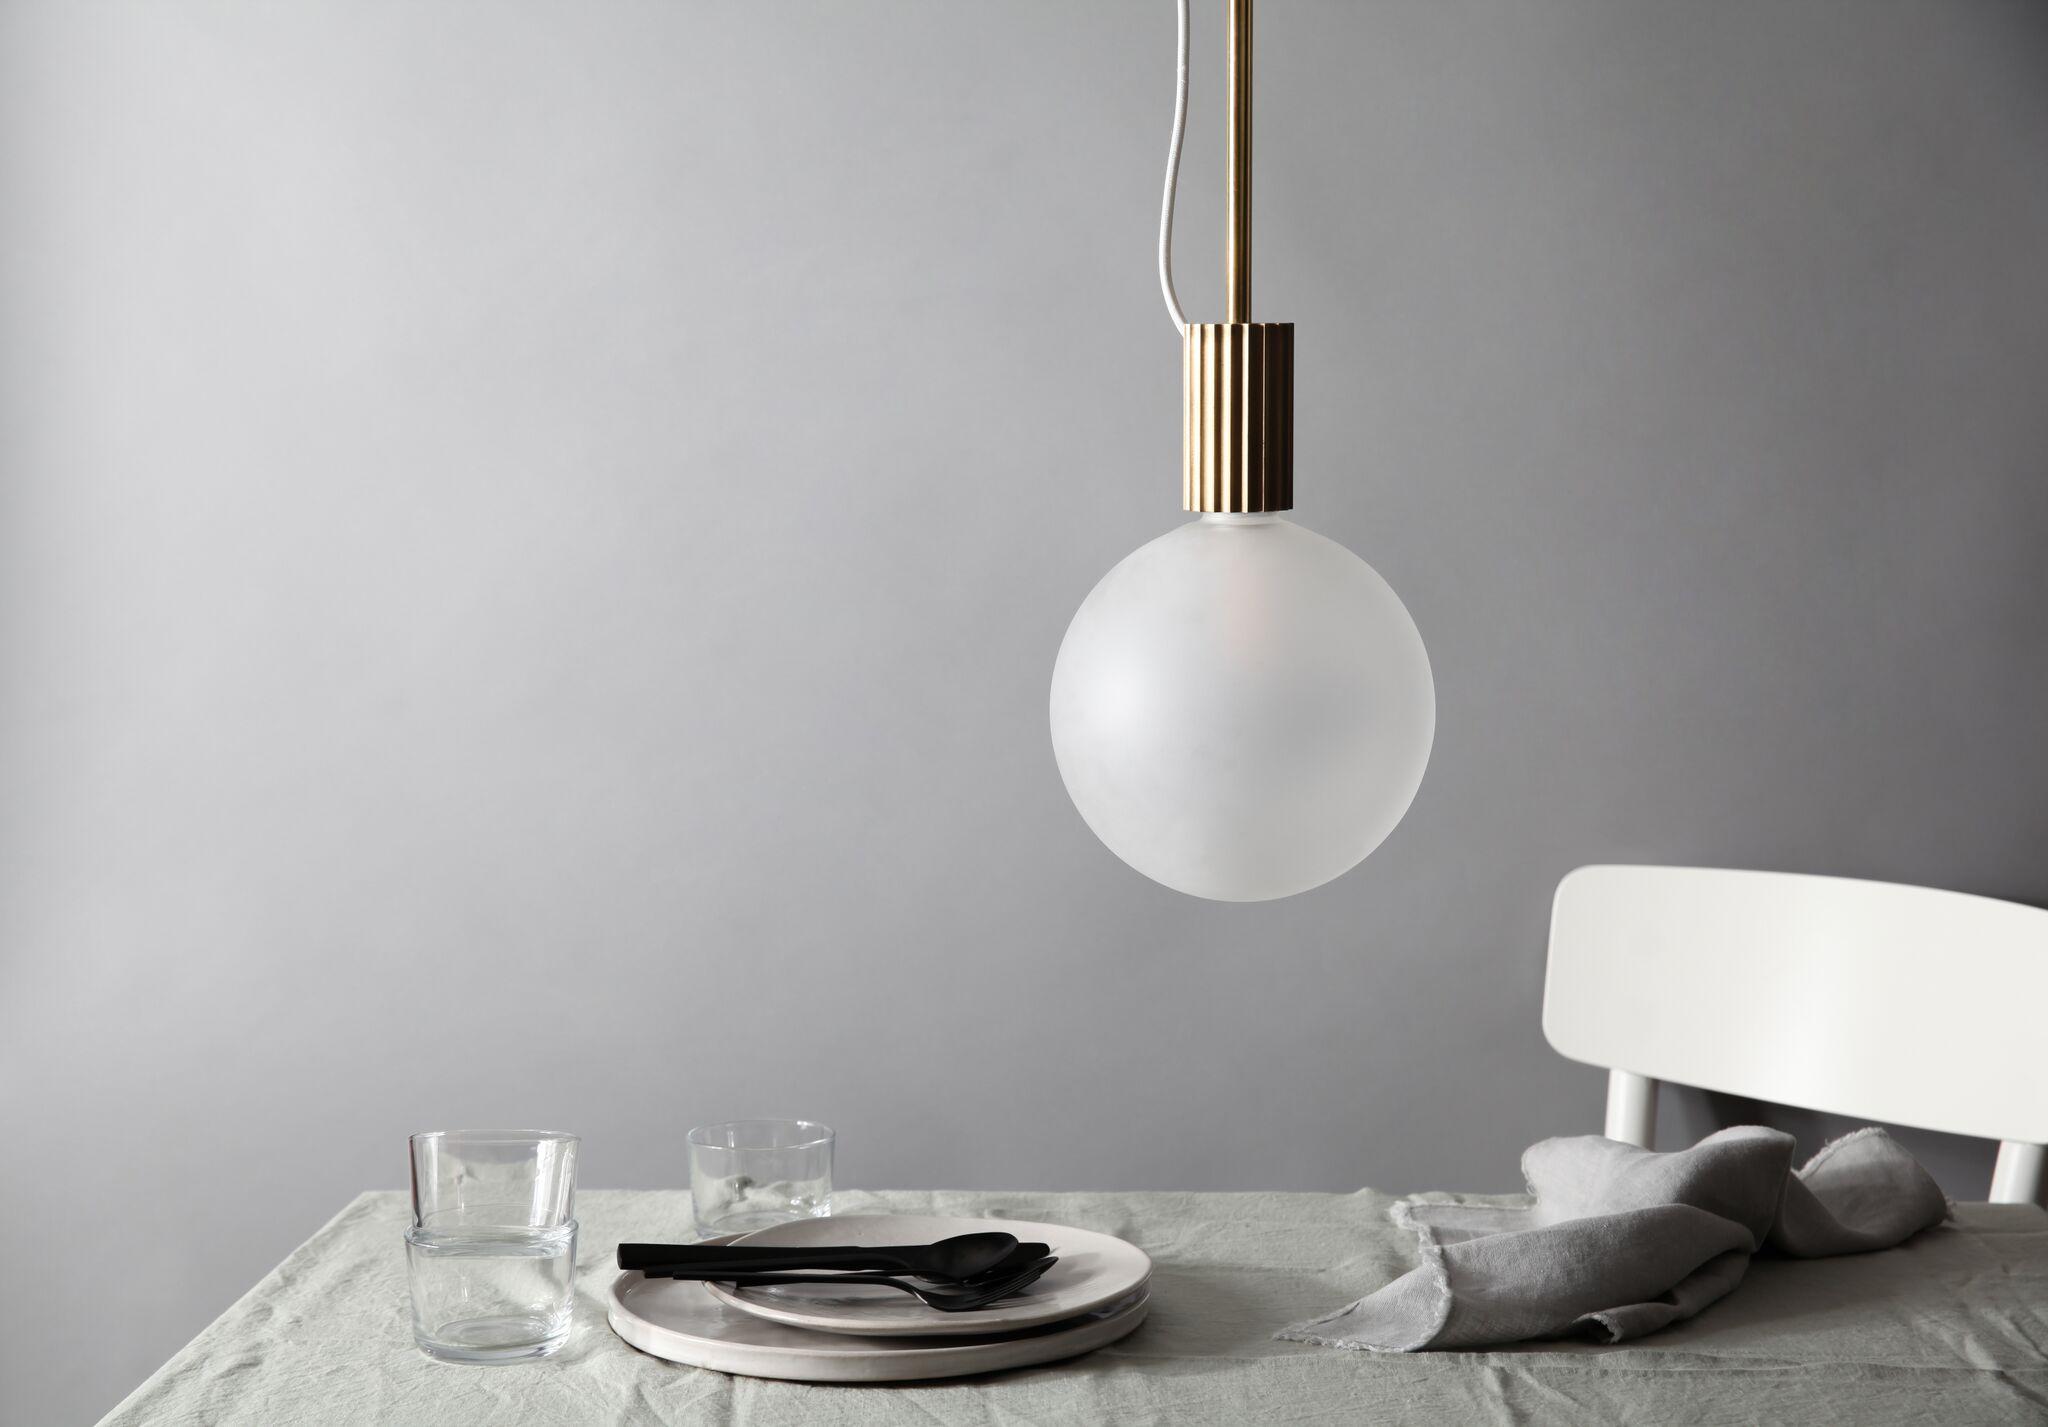 Attalos Lights By Marz Designs Local Australian Lighting & Furniture Design Bronte, Sydney Image 3